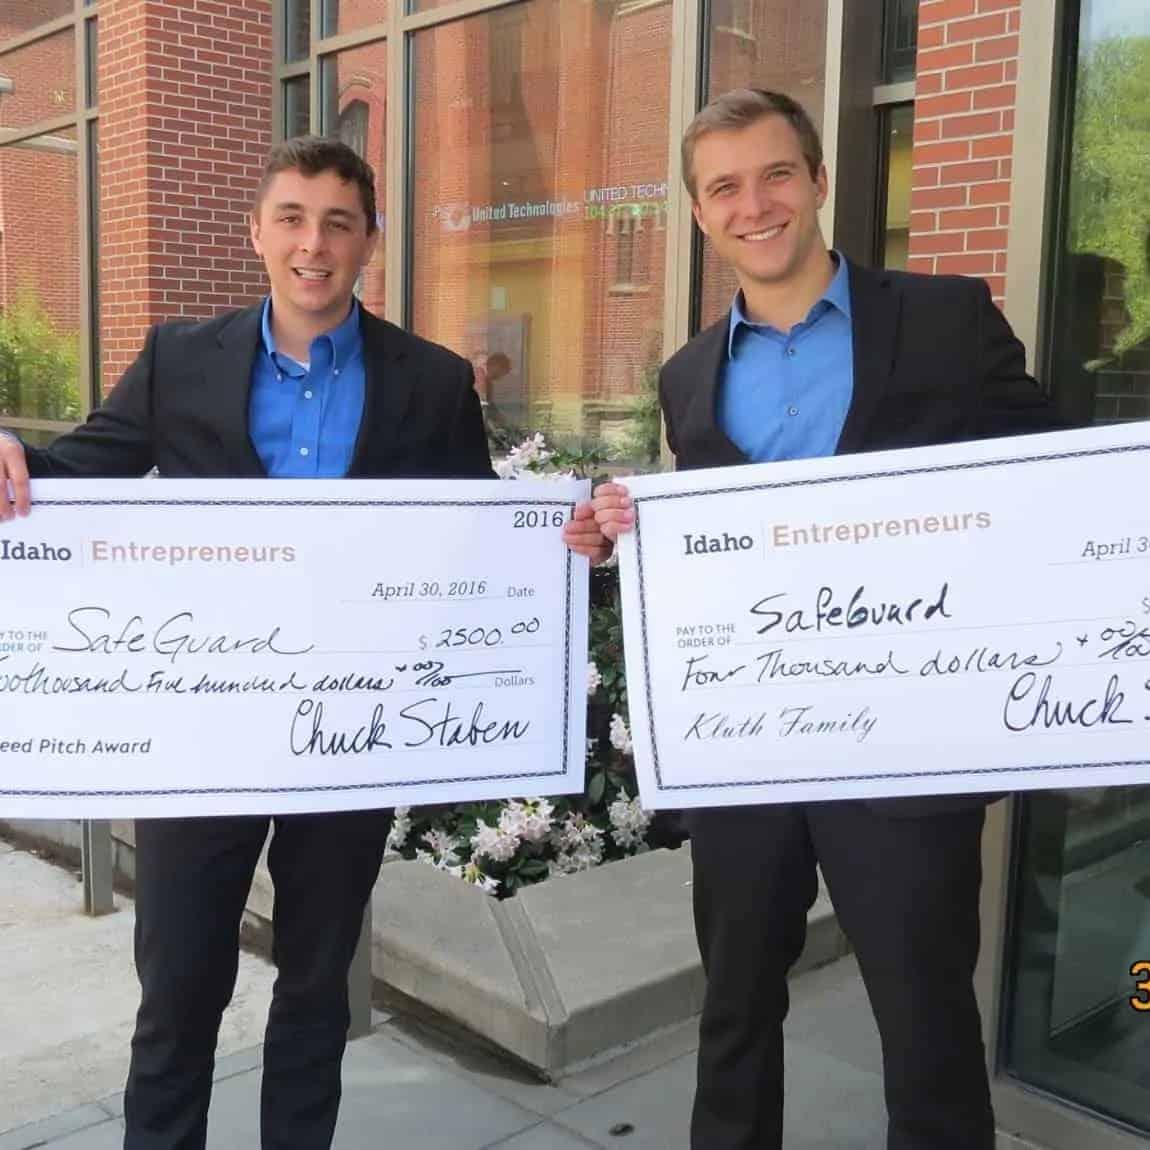 Idaho Entrepreneurs Award to Brandon Bledsoe and Tim Ledford